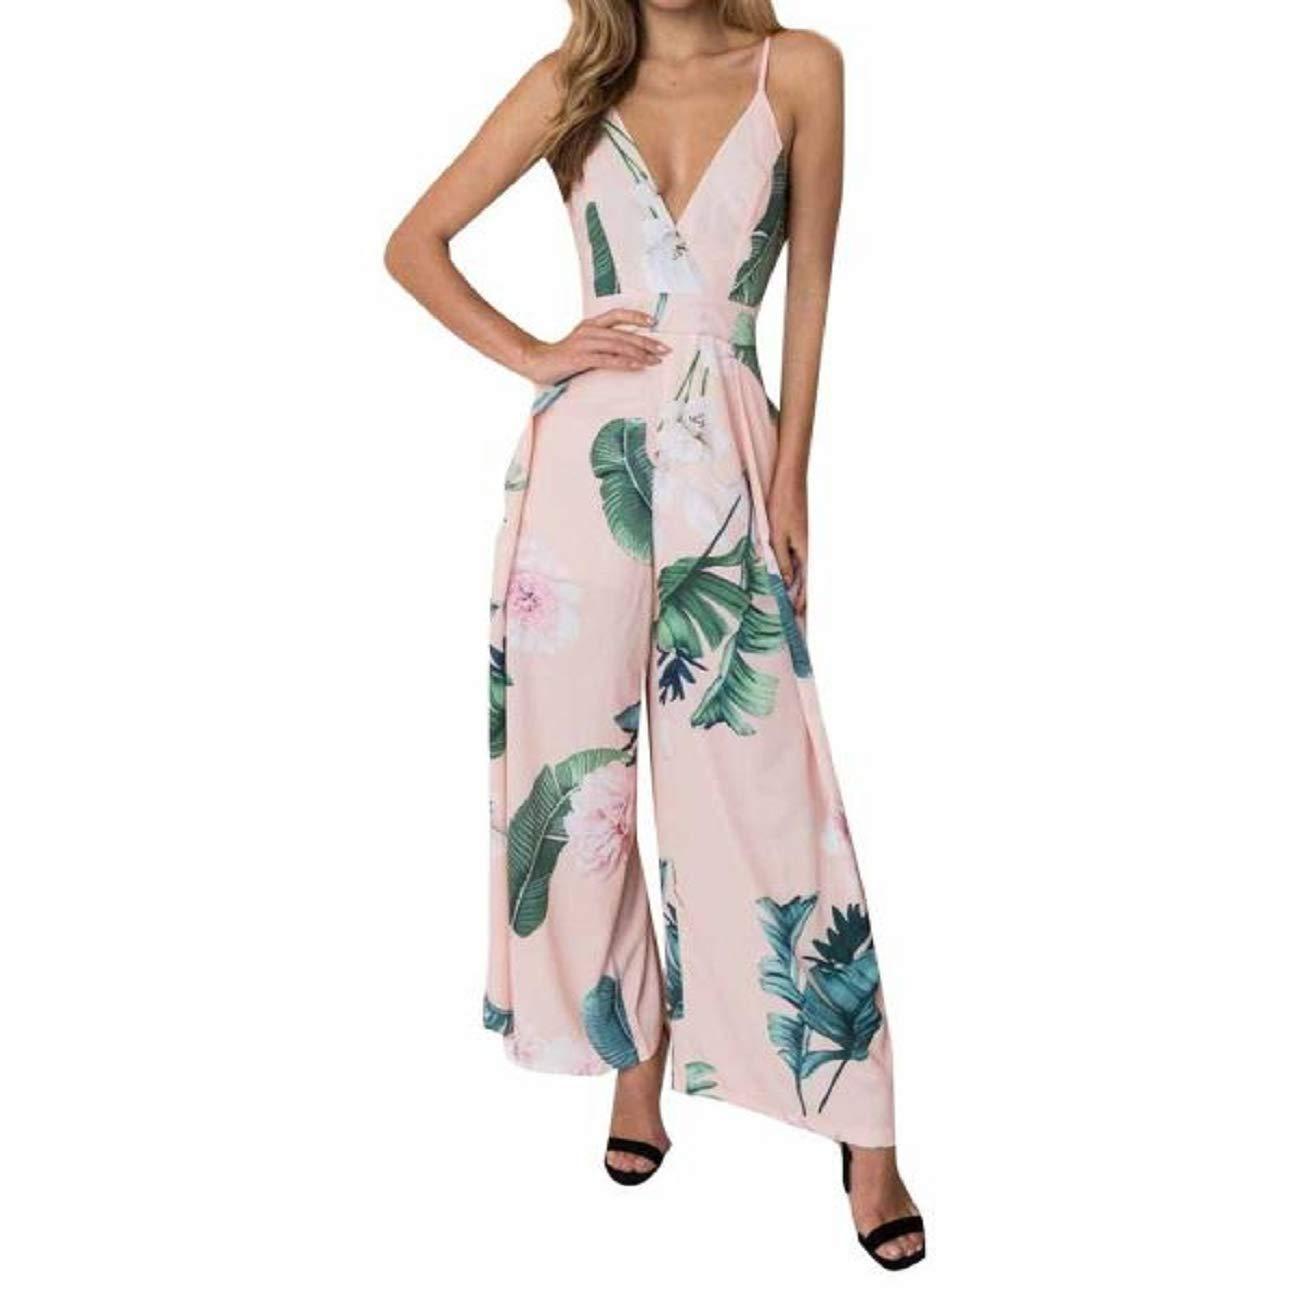 GWshop Ladies Fashion Elegant Jumpsuit Women Jumpsuits Elegant Wide Leg Strappy Holiday Long Playsuits Trousers Pink S